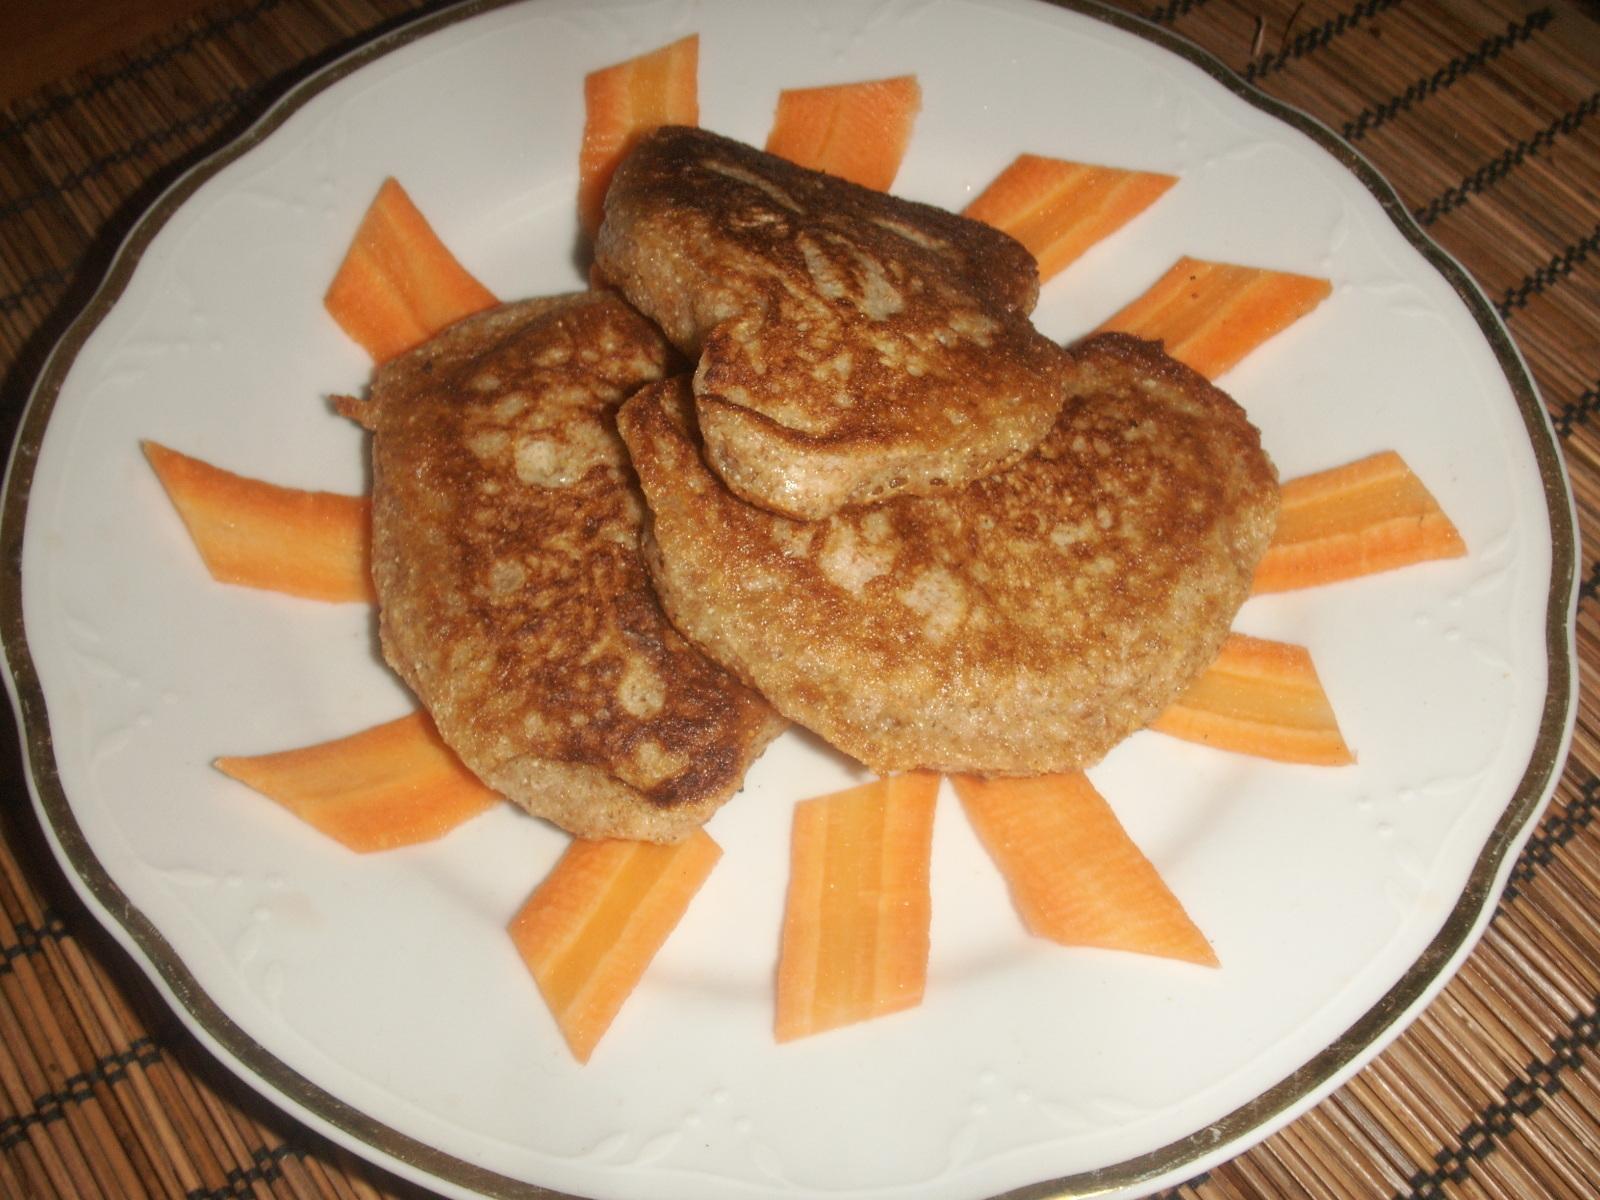 enkla glutenfria bröd